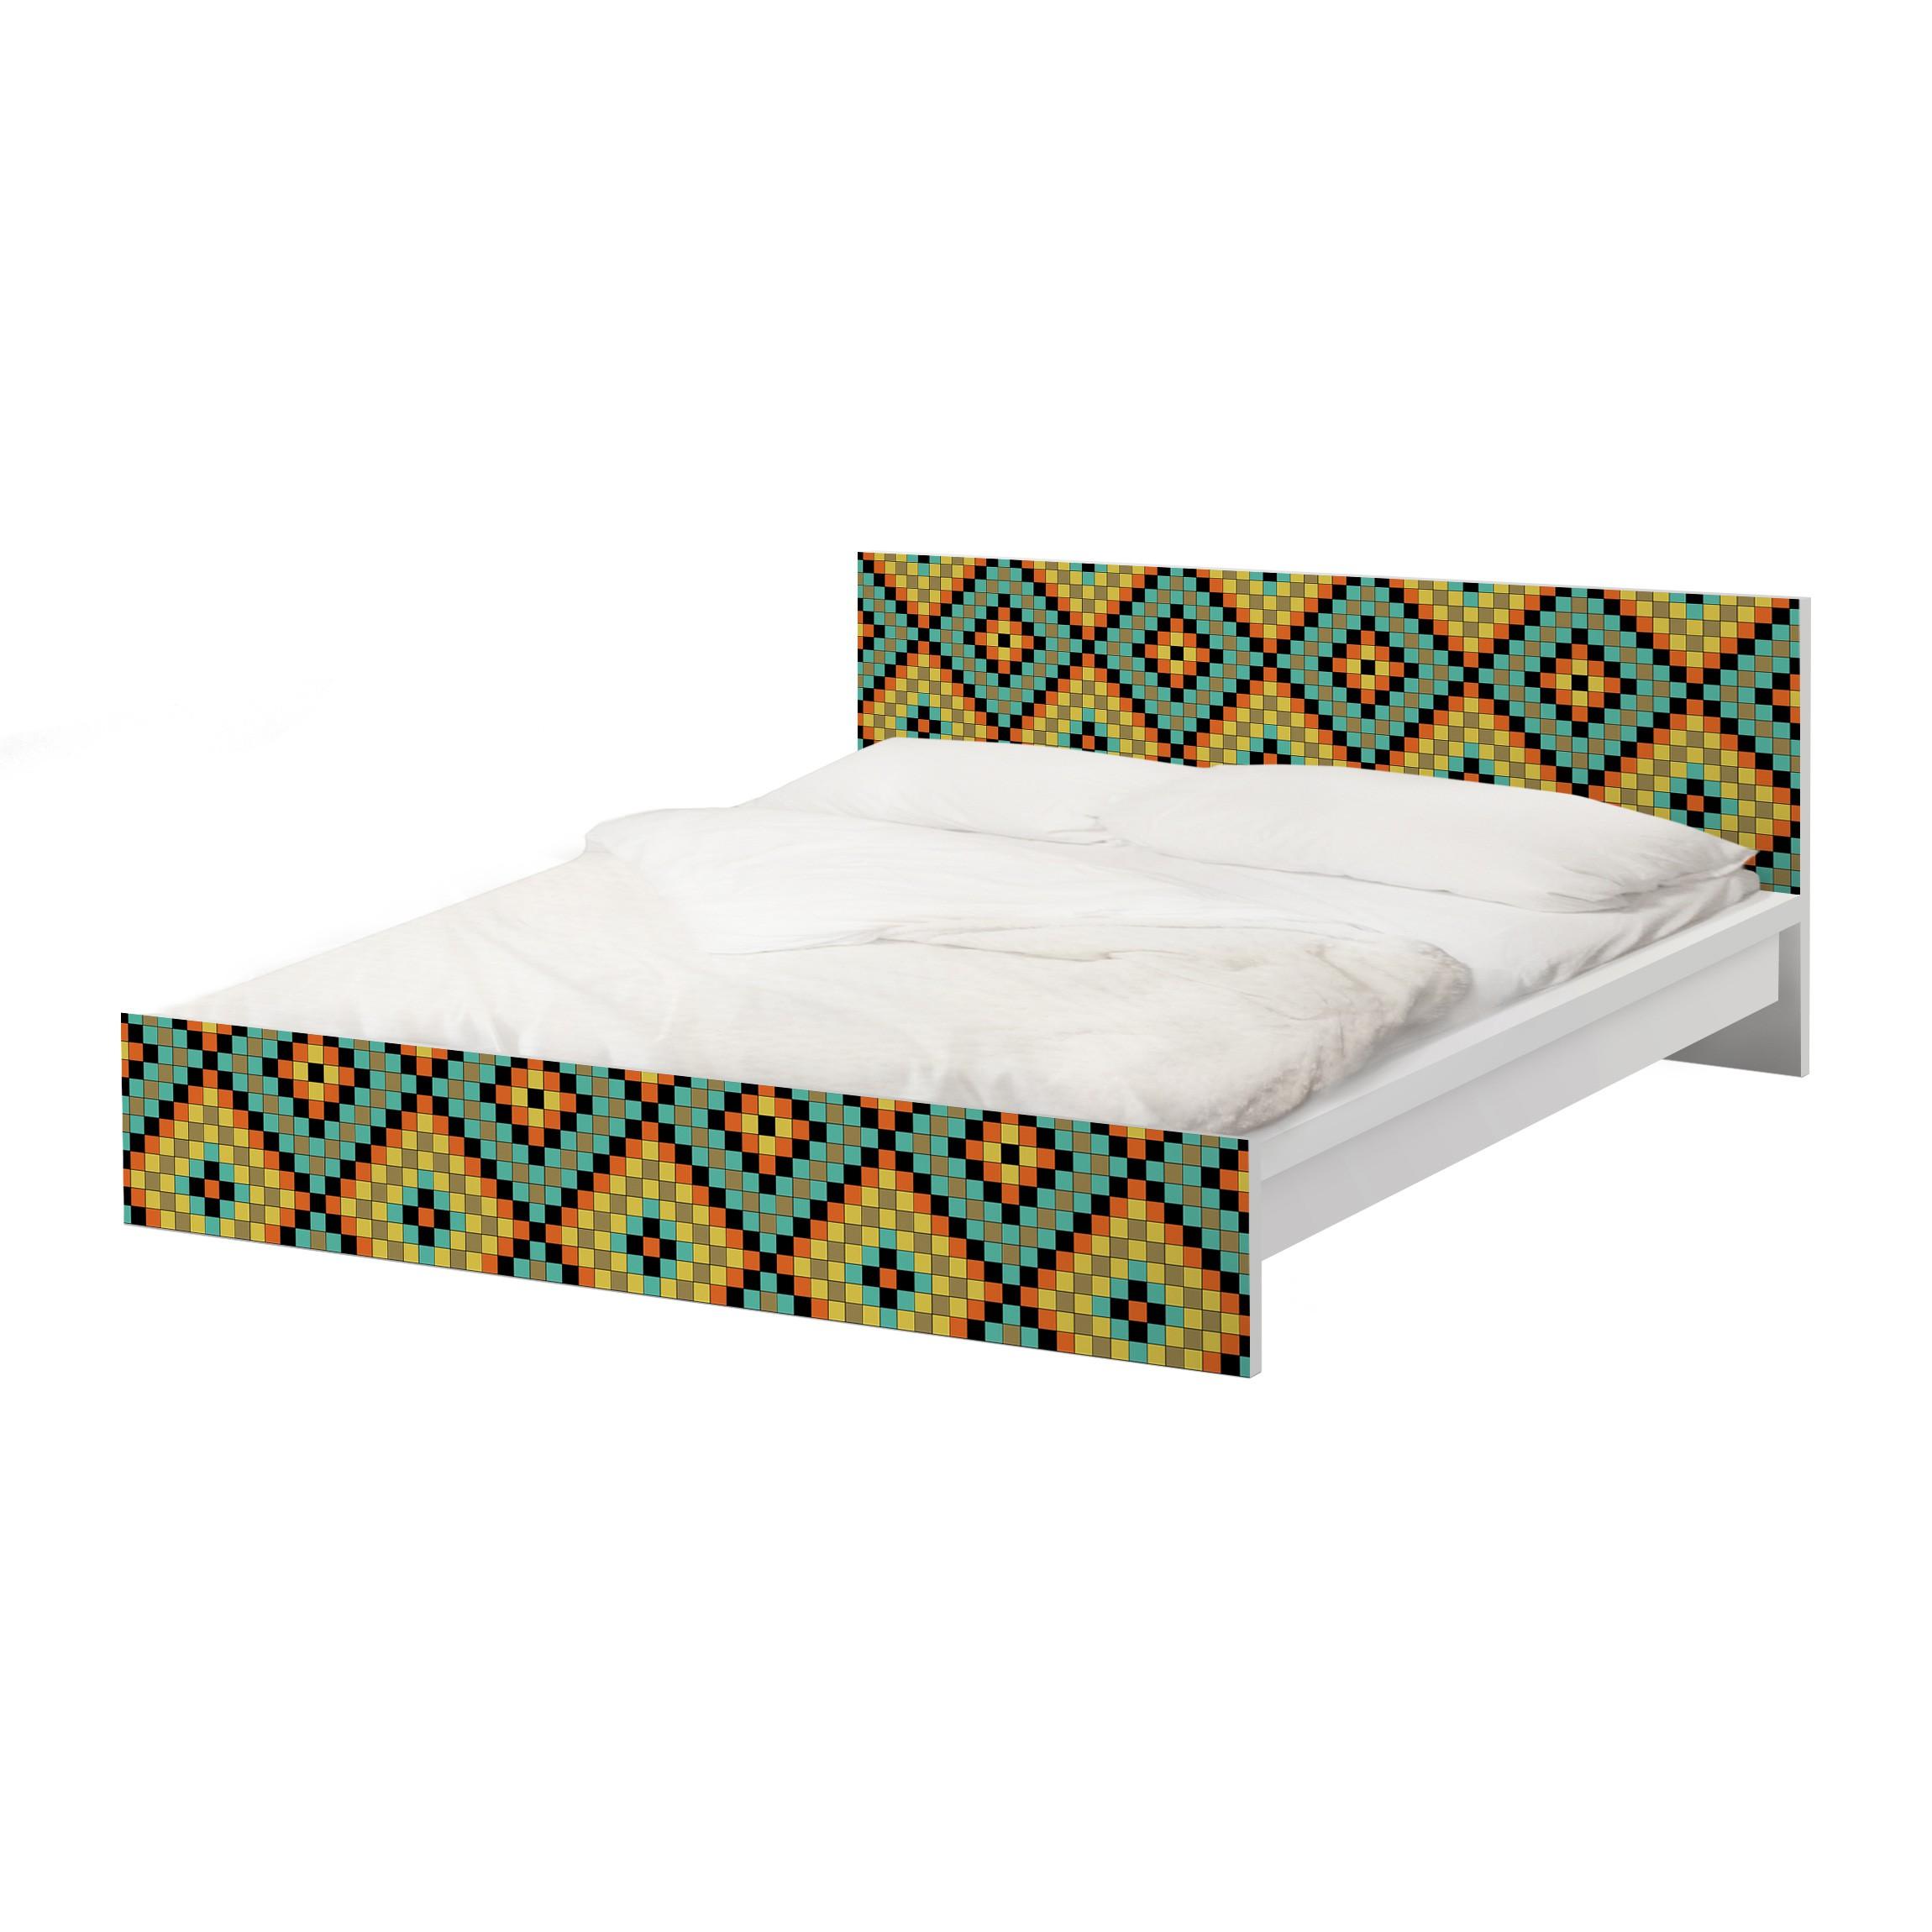 m belfolie f r ikea malm bett niedrig 160x200cm klebefolie buntes mosaik. Black Bedroom Furniture Sets. Home Design Ideas